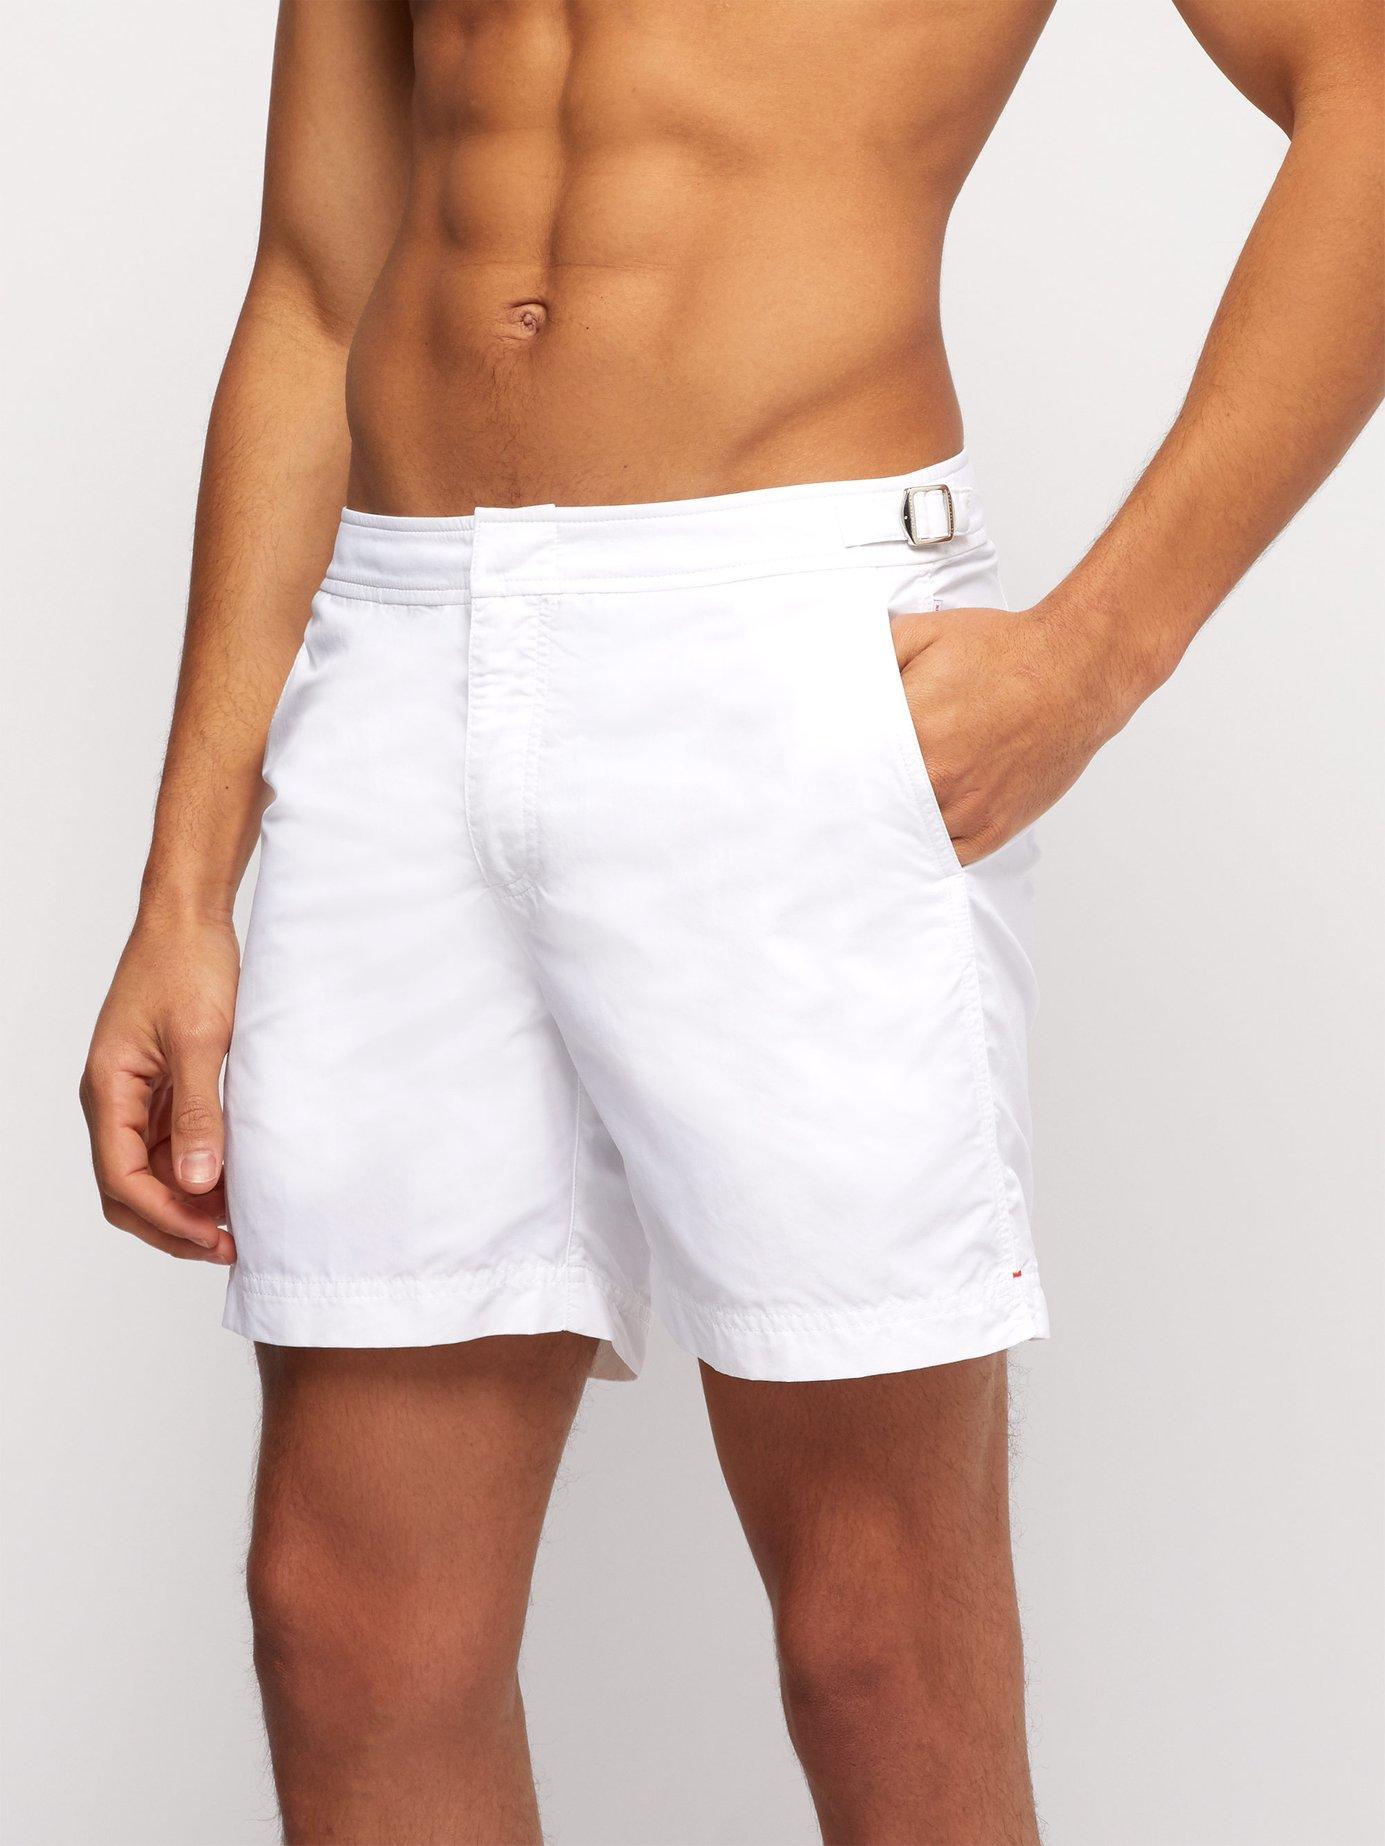 125fbc5658d17 Lyst - Orlebar Brown Bulldog Twill Swim Shorts in White for Men